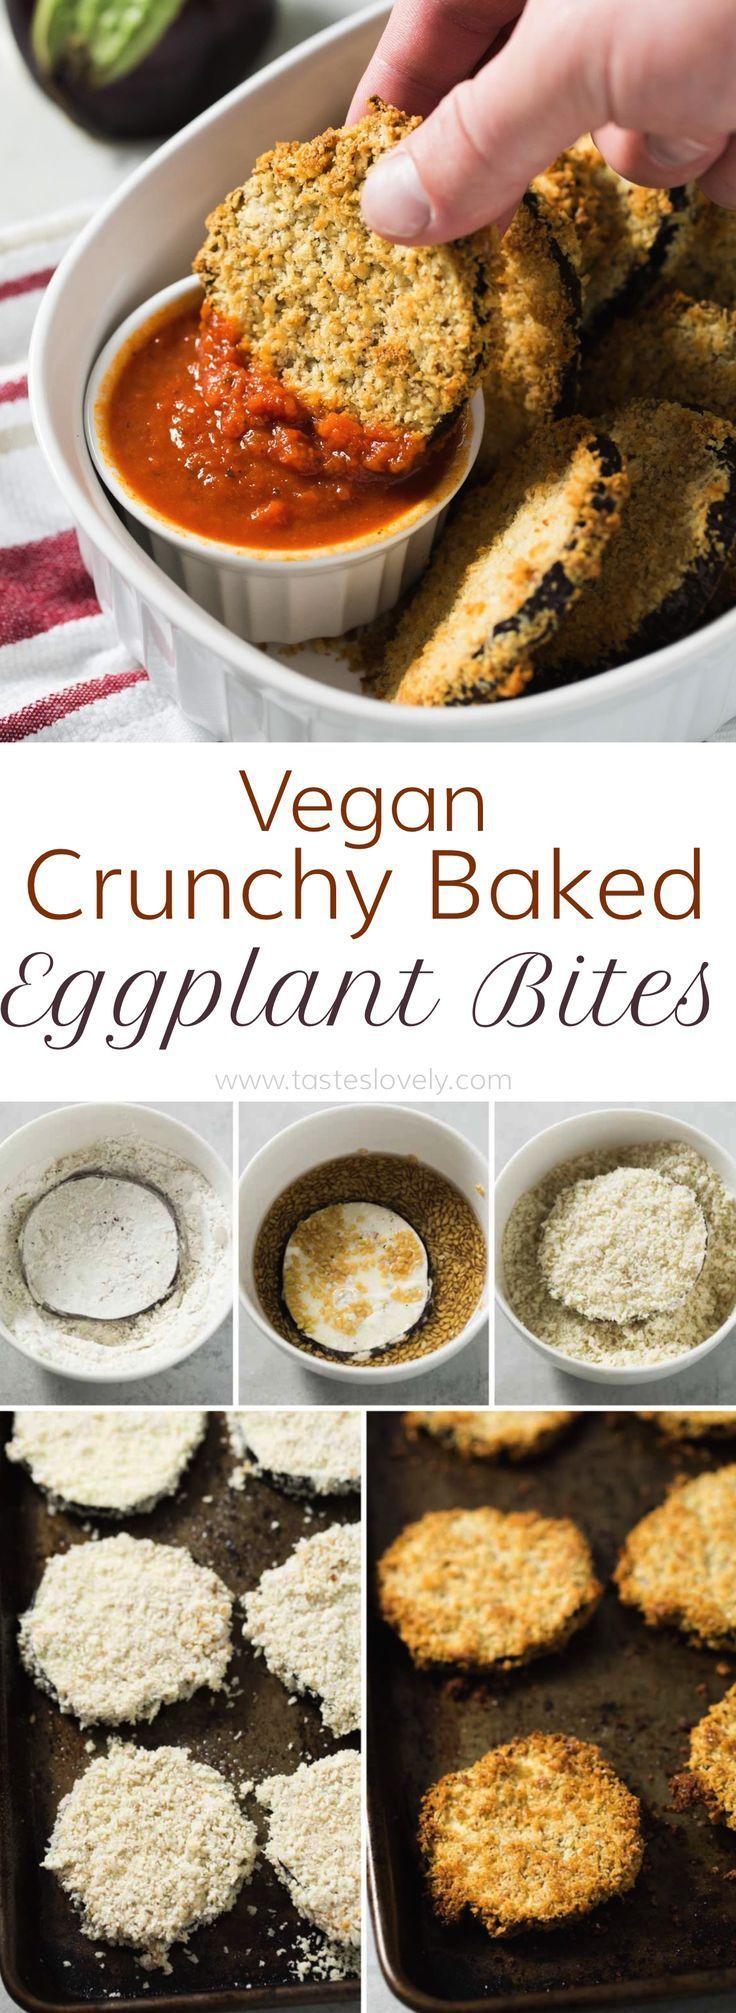 Vegan Crunchy Baked Eggplant Bites #PickedAtPeak ad